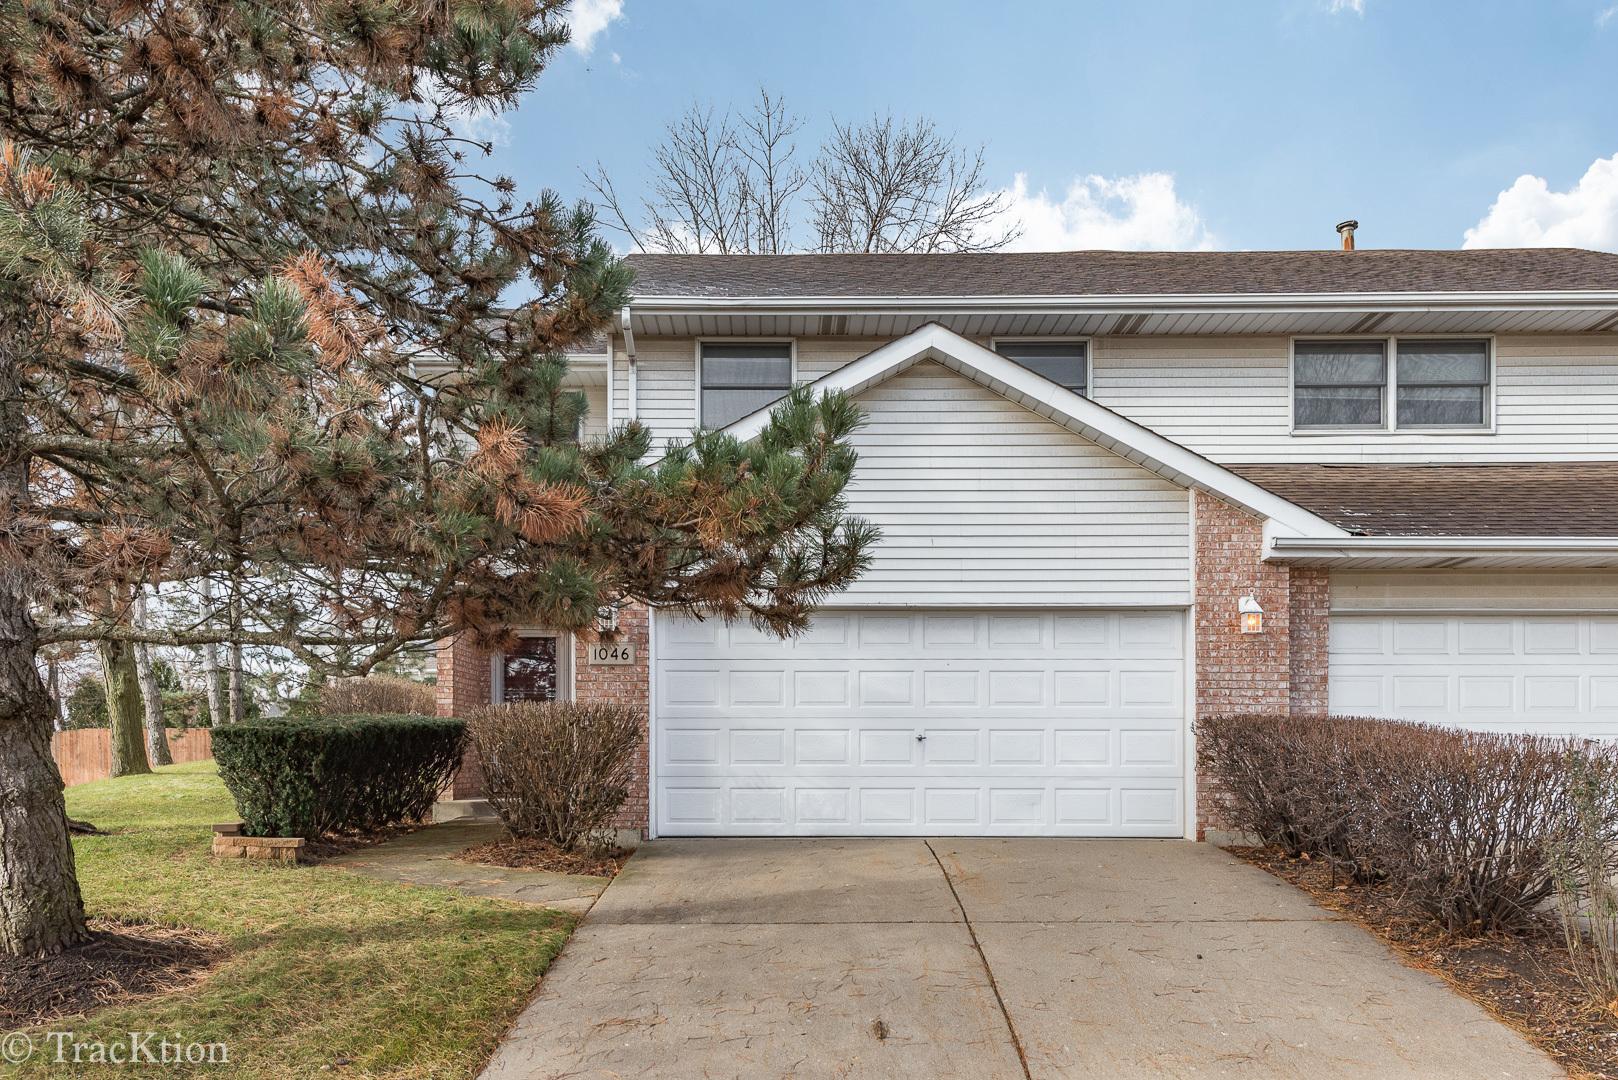 1046 Pinewood Drive, Downers Grove, Illinois